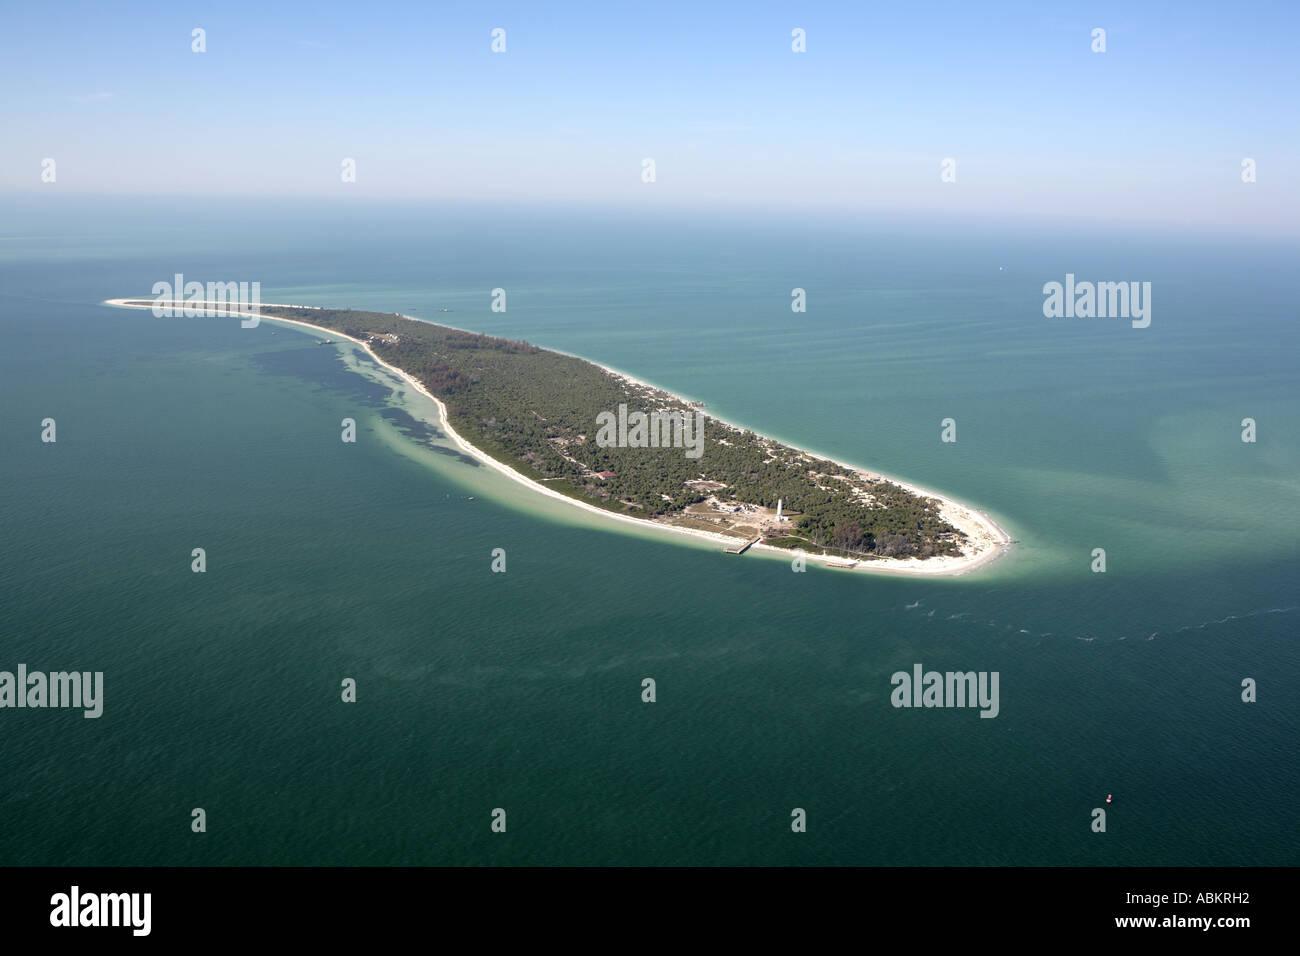 South Florida Gulf Coast Islands